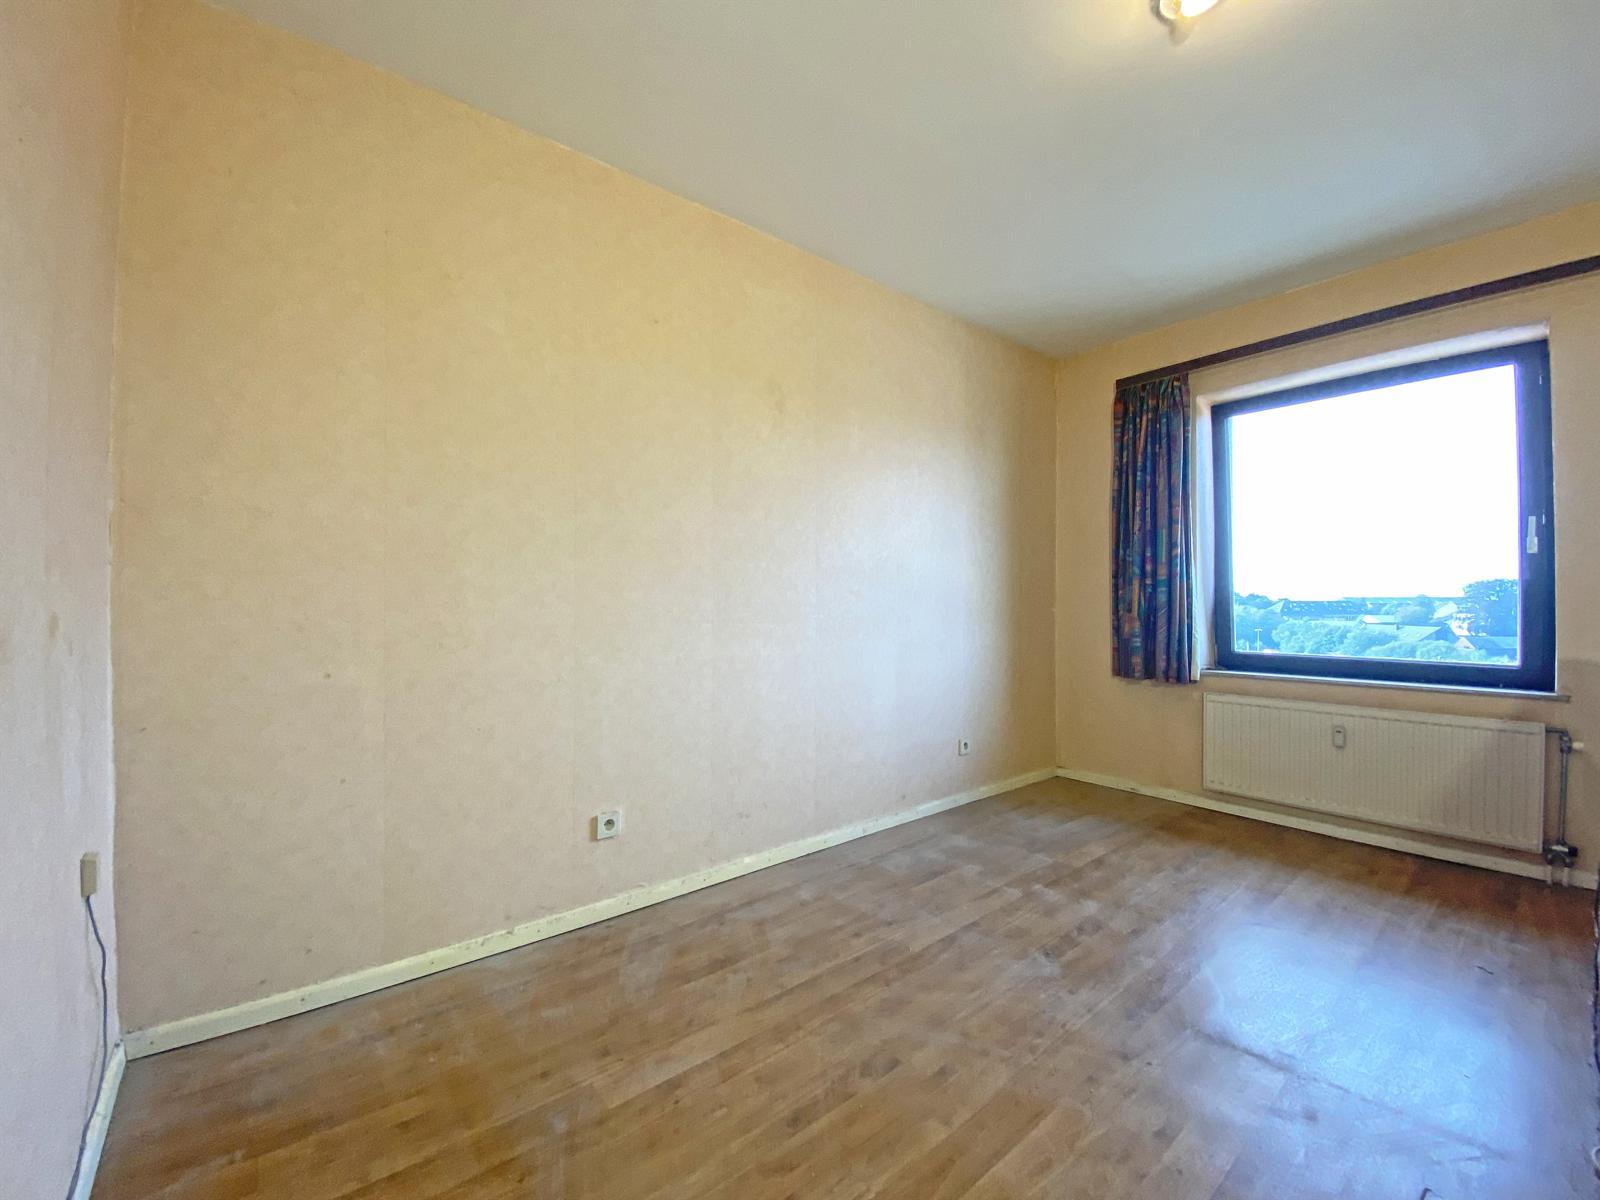 Appartement - Libramont-Chevigny - #4501248-4